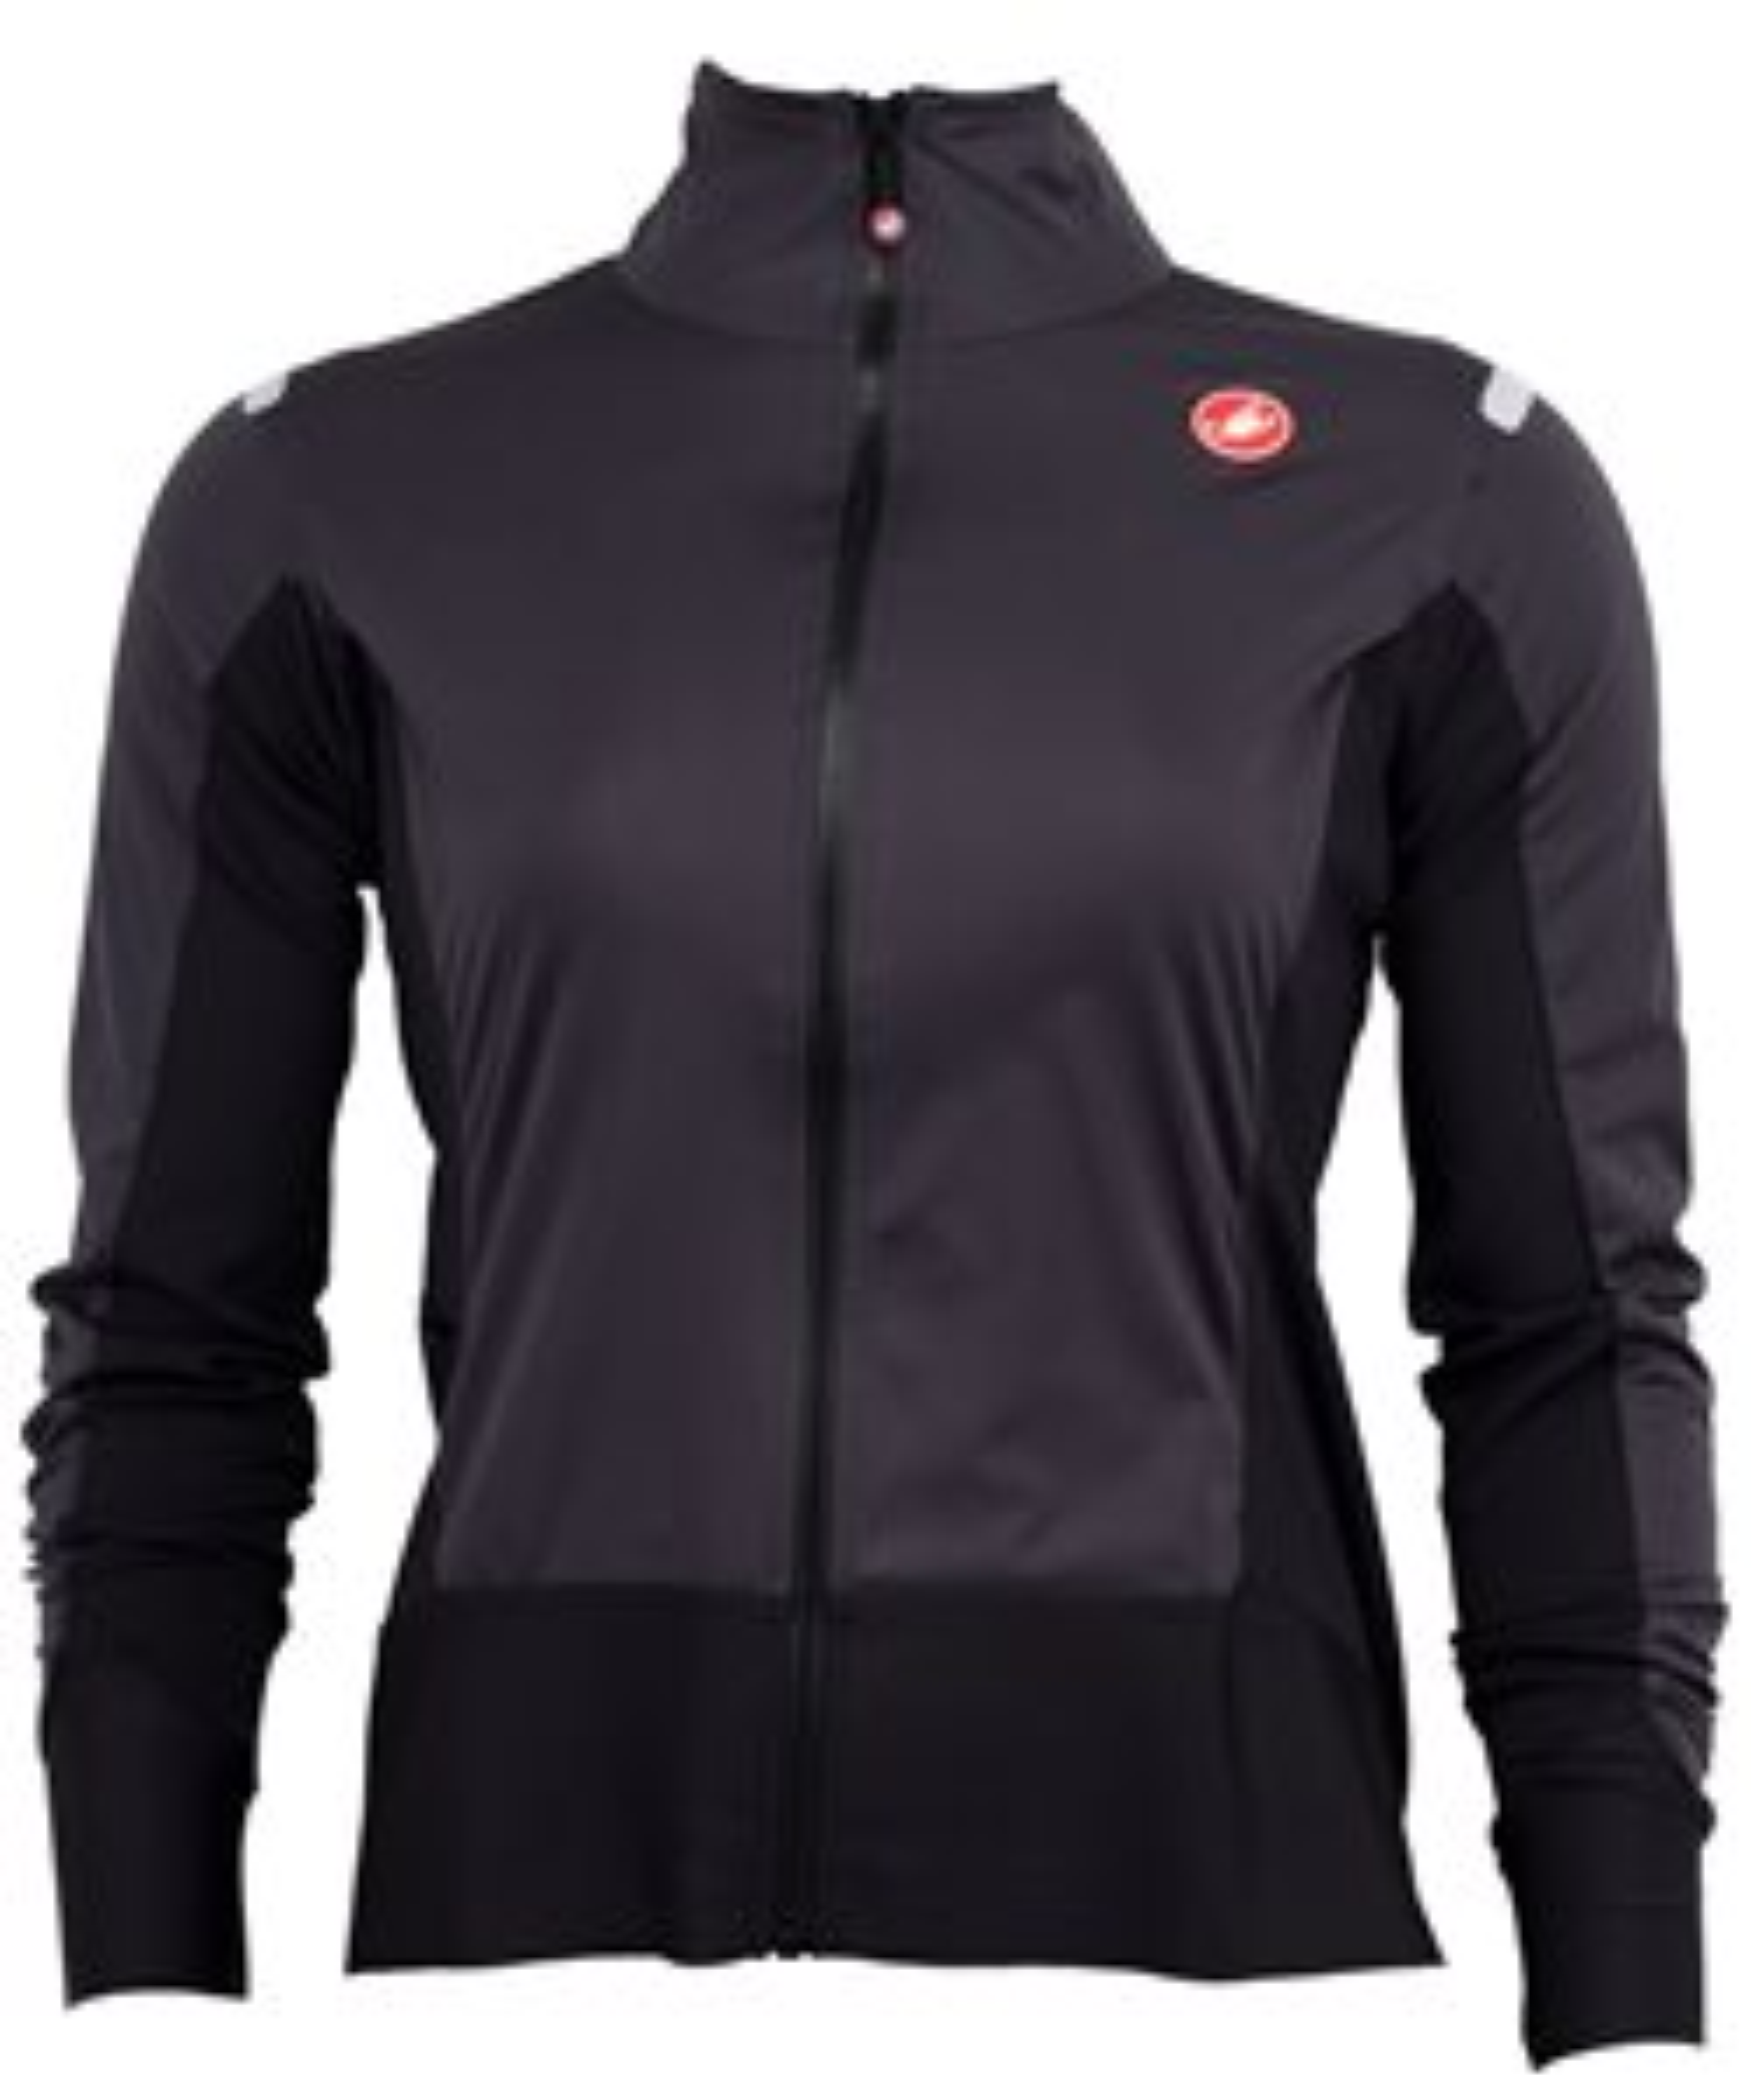 Castelli Alpha Ros W Light Jacket Women's Size Small in Dark Gray/Black